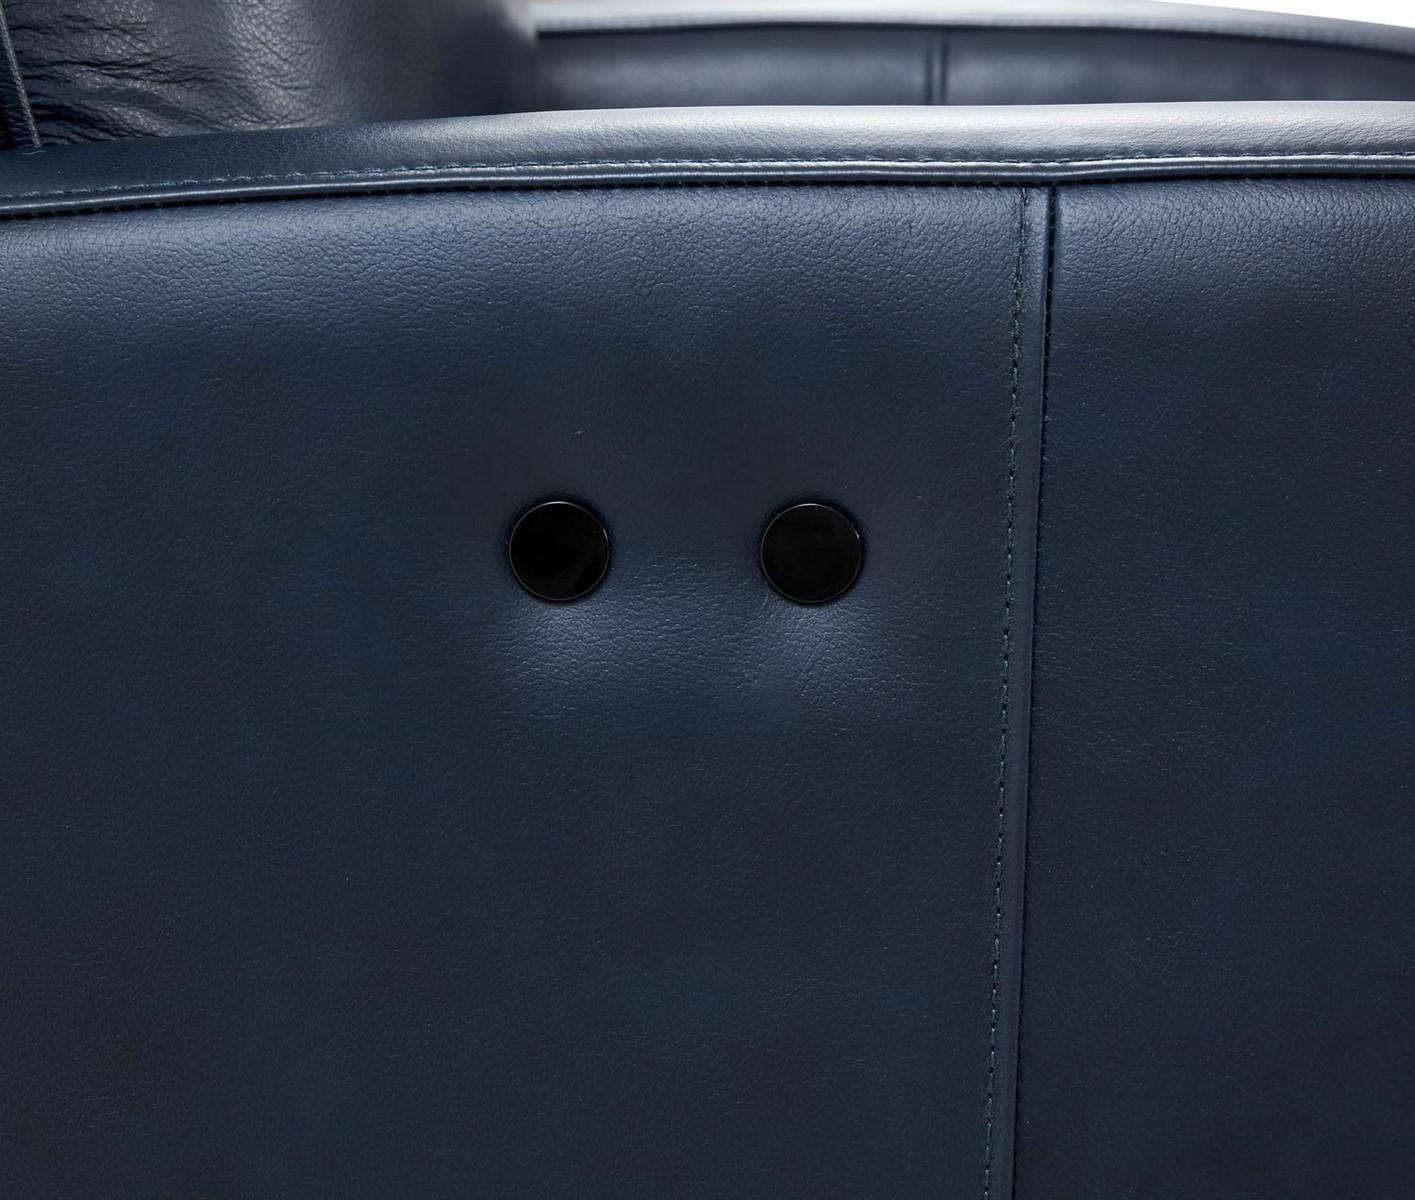 Barcalounger Penrose Power Recliner Chair - Shoreham Blue/All Leather